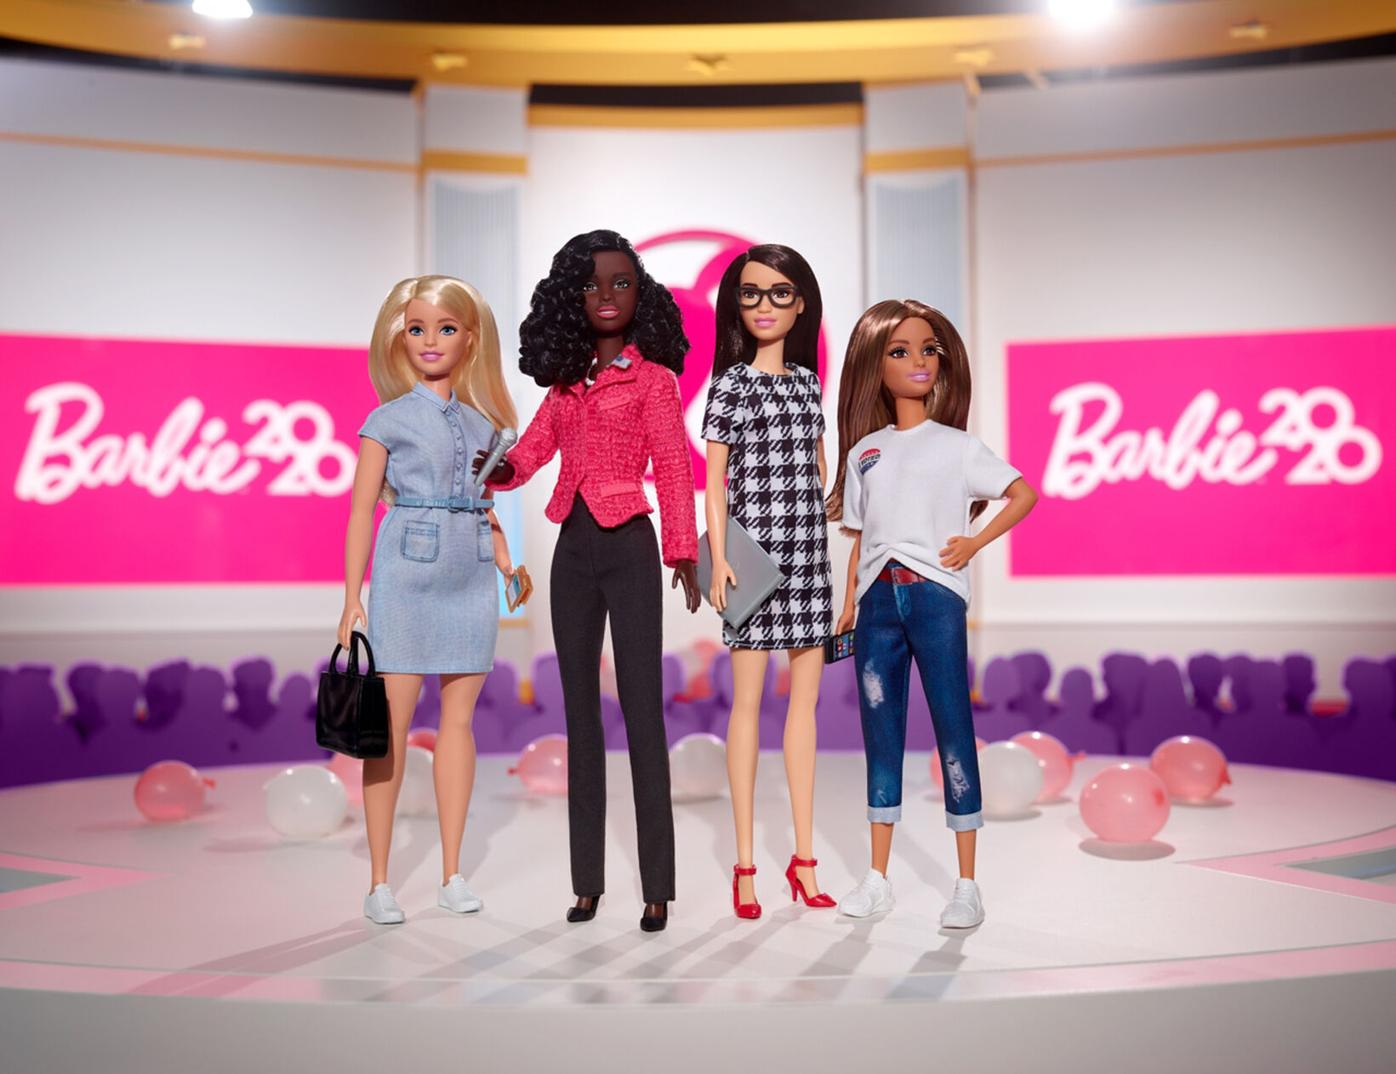 Barbie's new Campaign Team